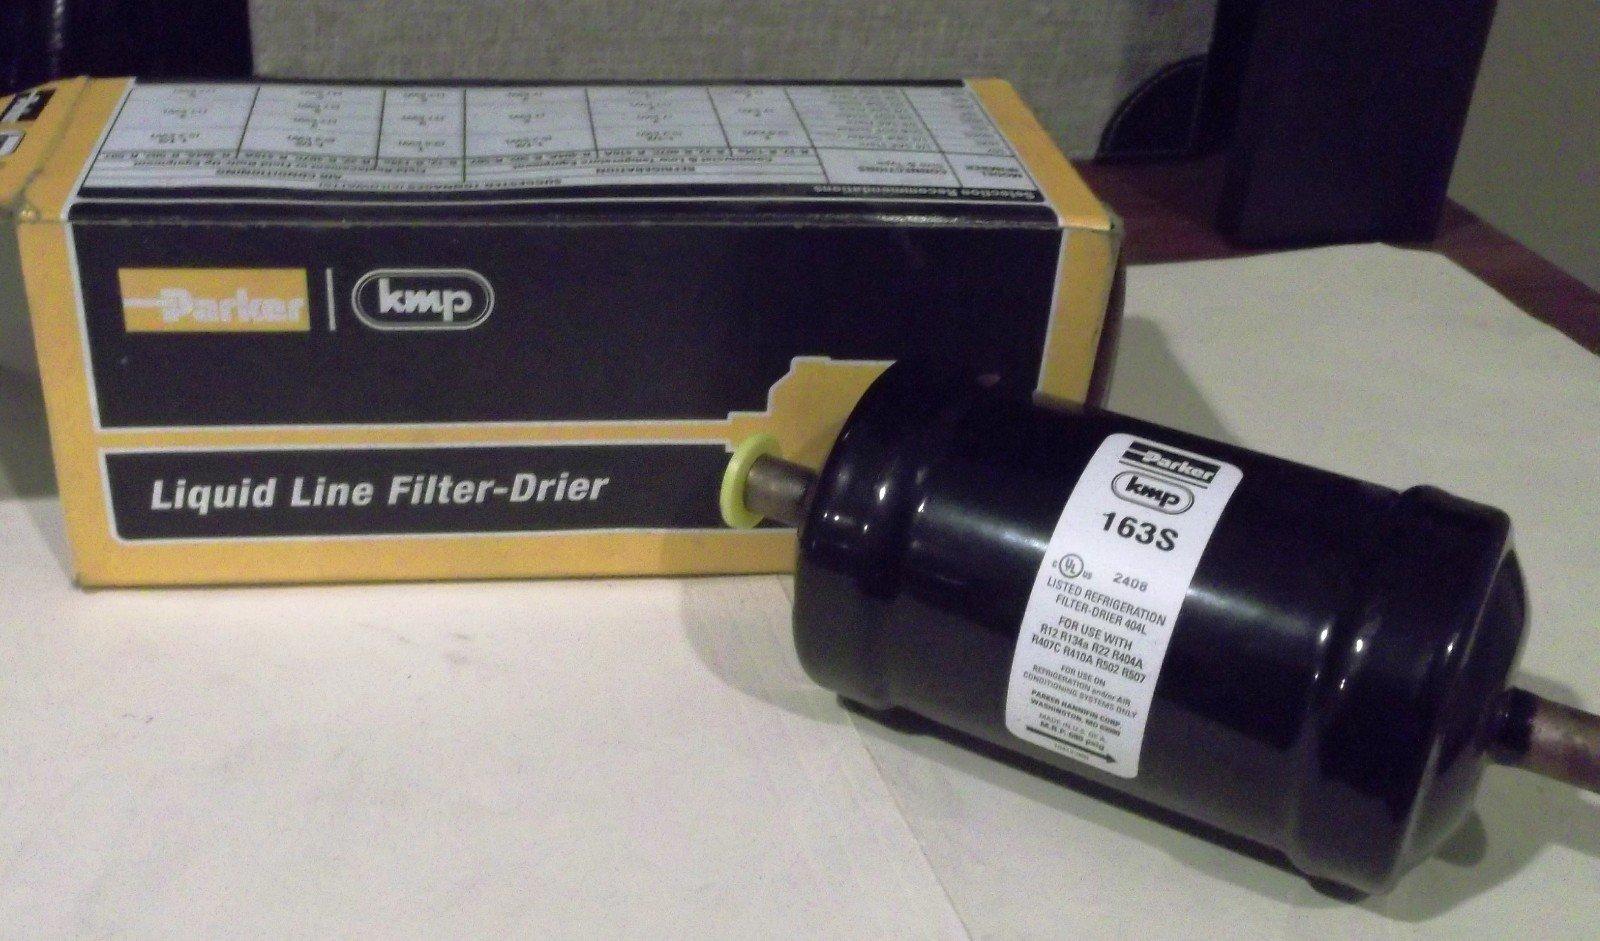 Parker Hannifin 163S Gold Label Steel Liquid Line Filter-Drier, 3/8'' Odf Solder Fitting, 2.38'' Shell Diameter, 5.94'' Length